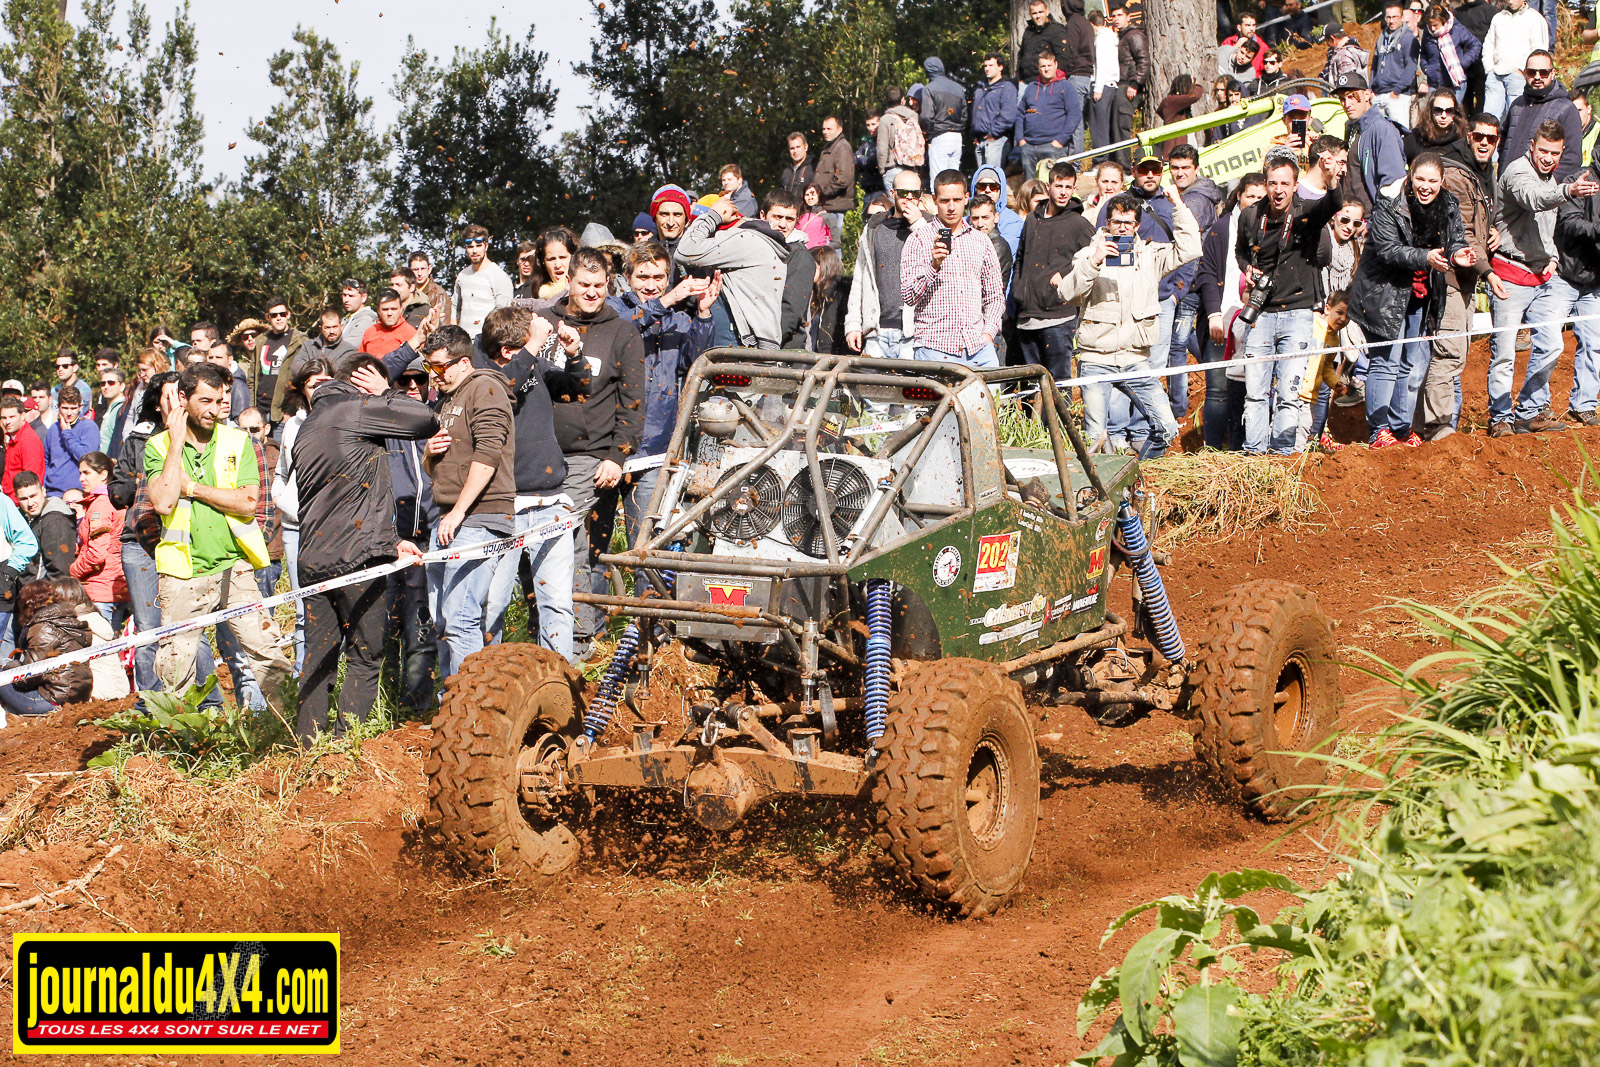 Prato & Prego - Winner  'Extreme' Class